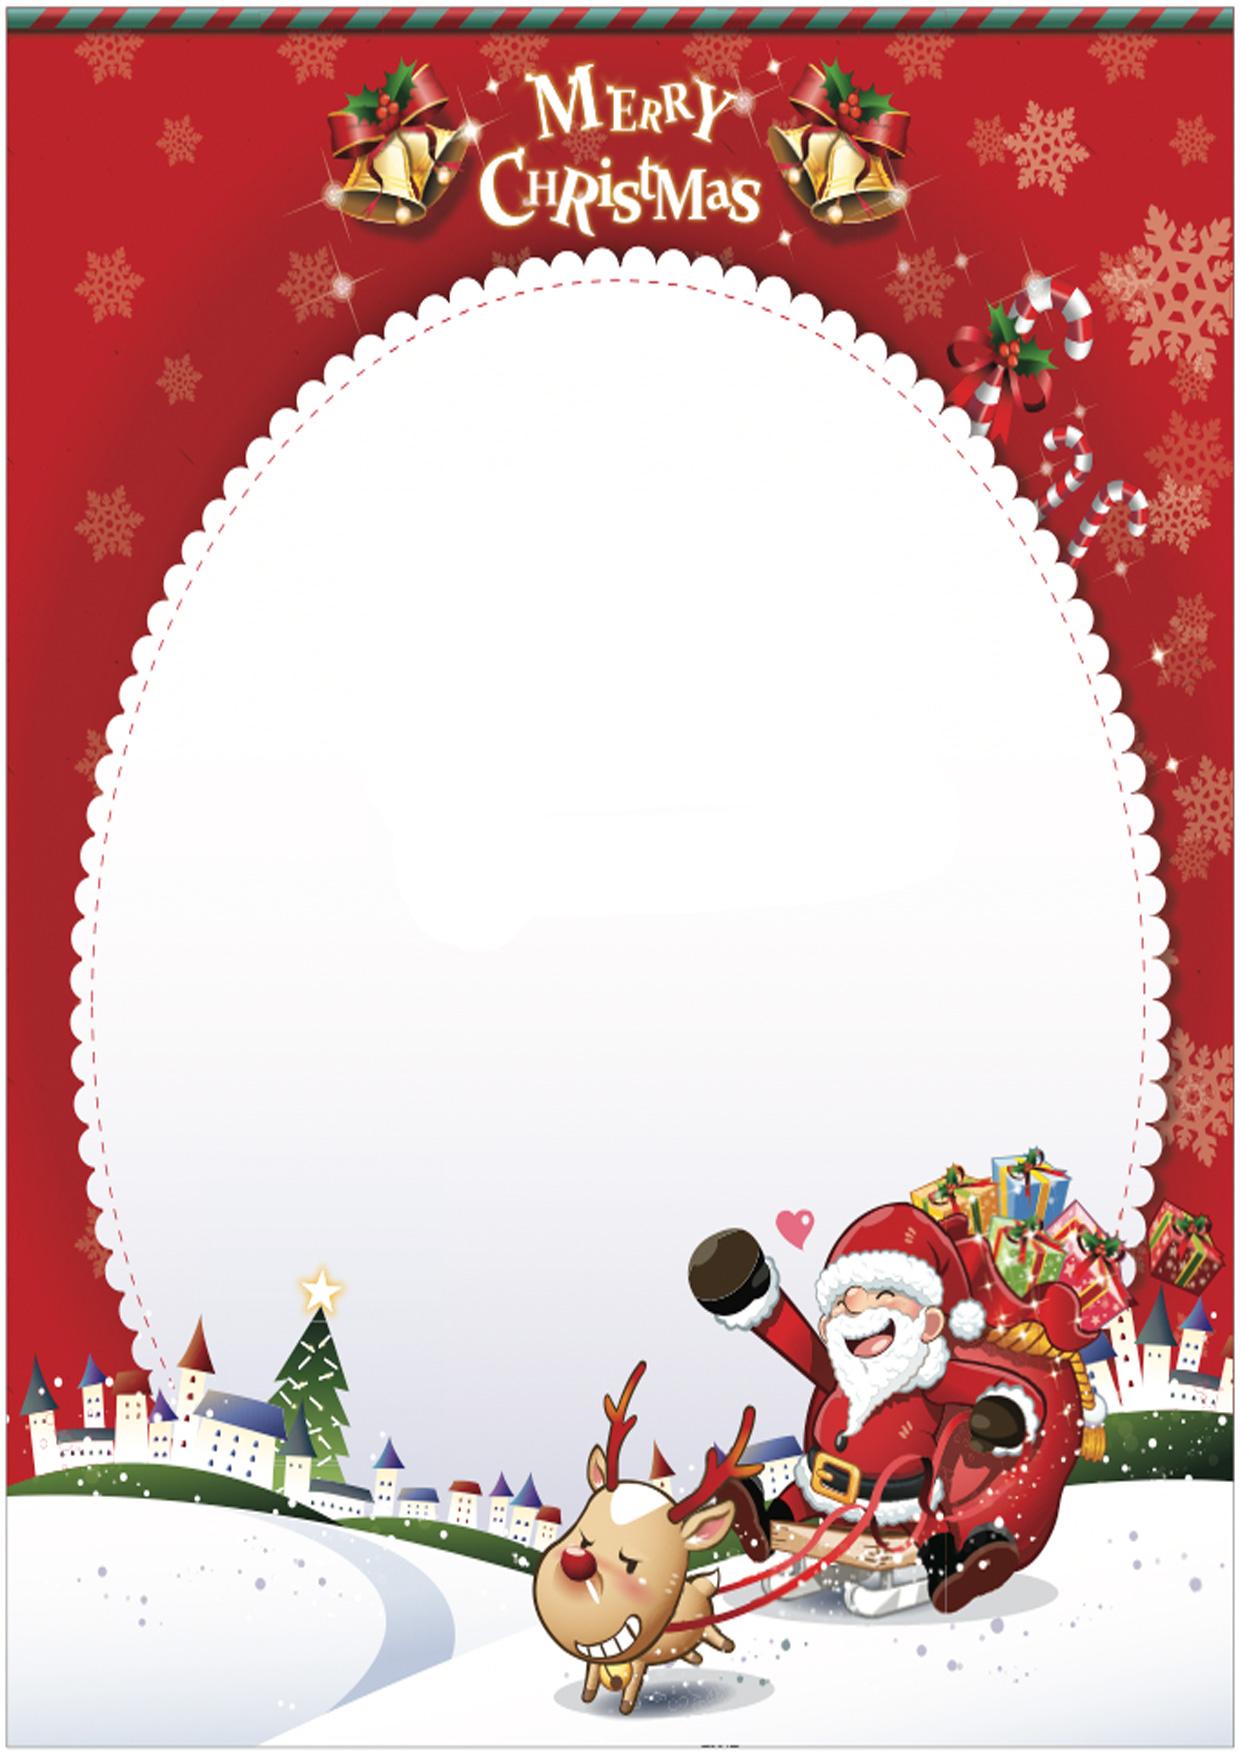 lettera a Babbo Natale n 1